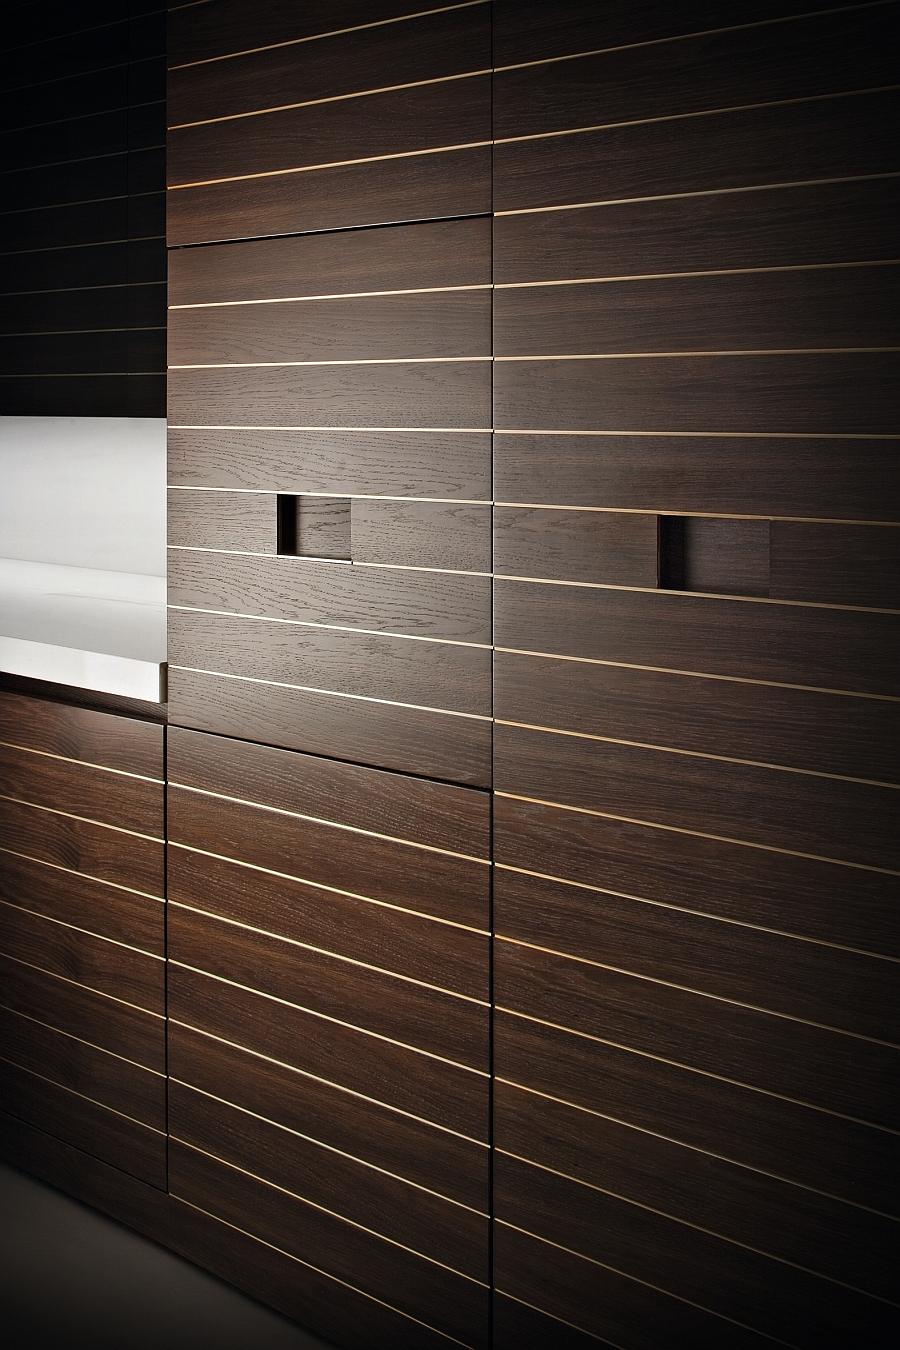 Stunning modern kitchen from Armani & Dada with sleek minimalism